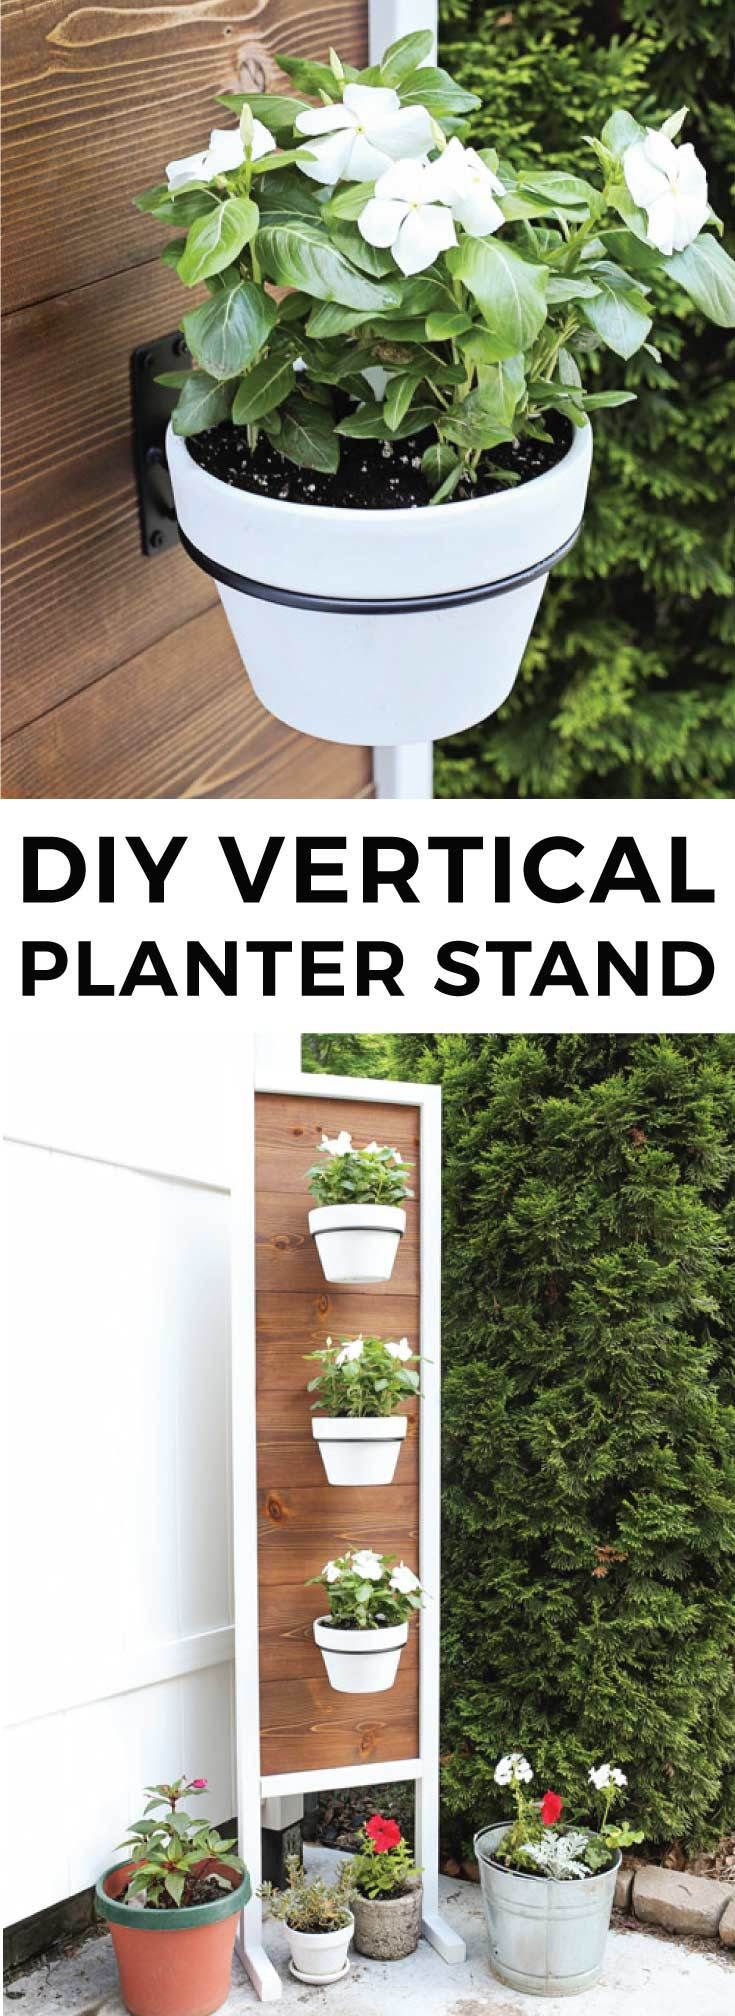 Planter Herbes Aromatiques Jardiniere diy vertical planter stand | decoration jardin, jardins